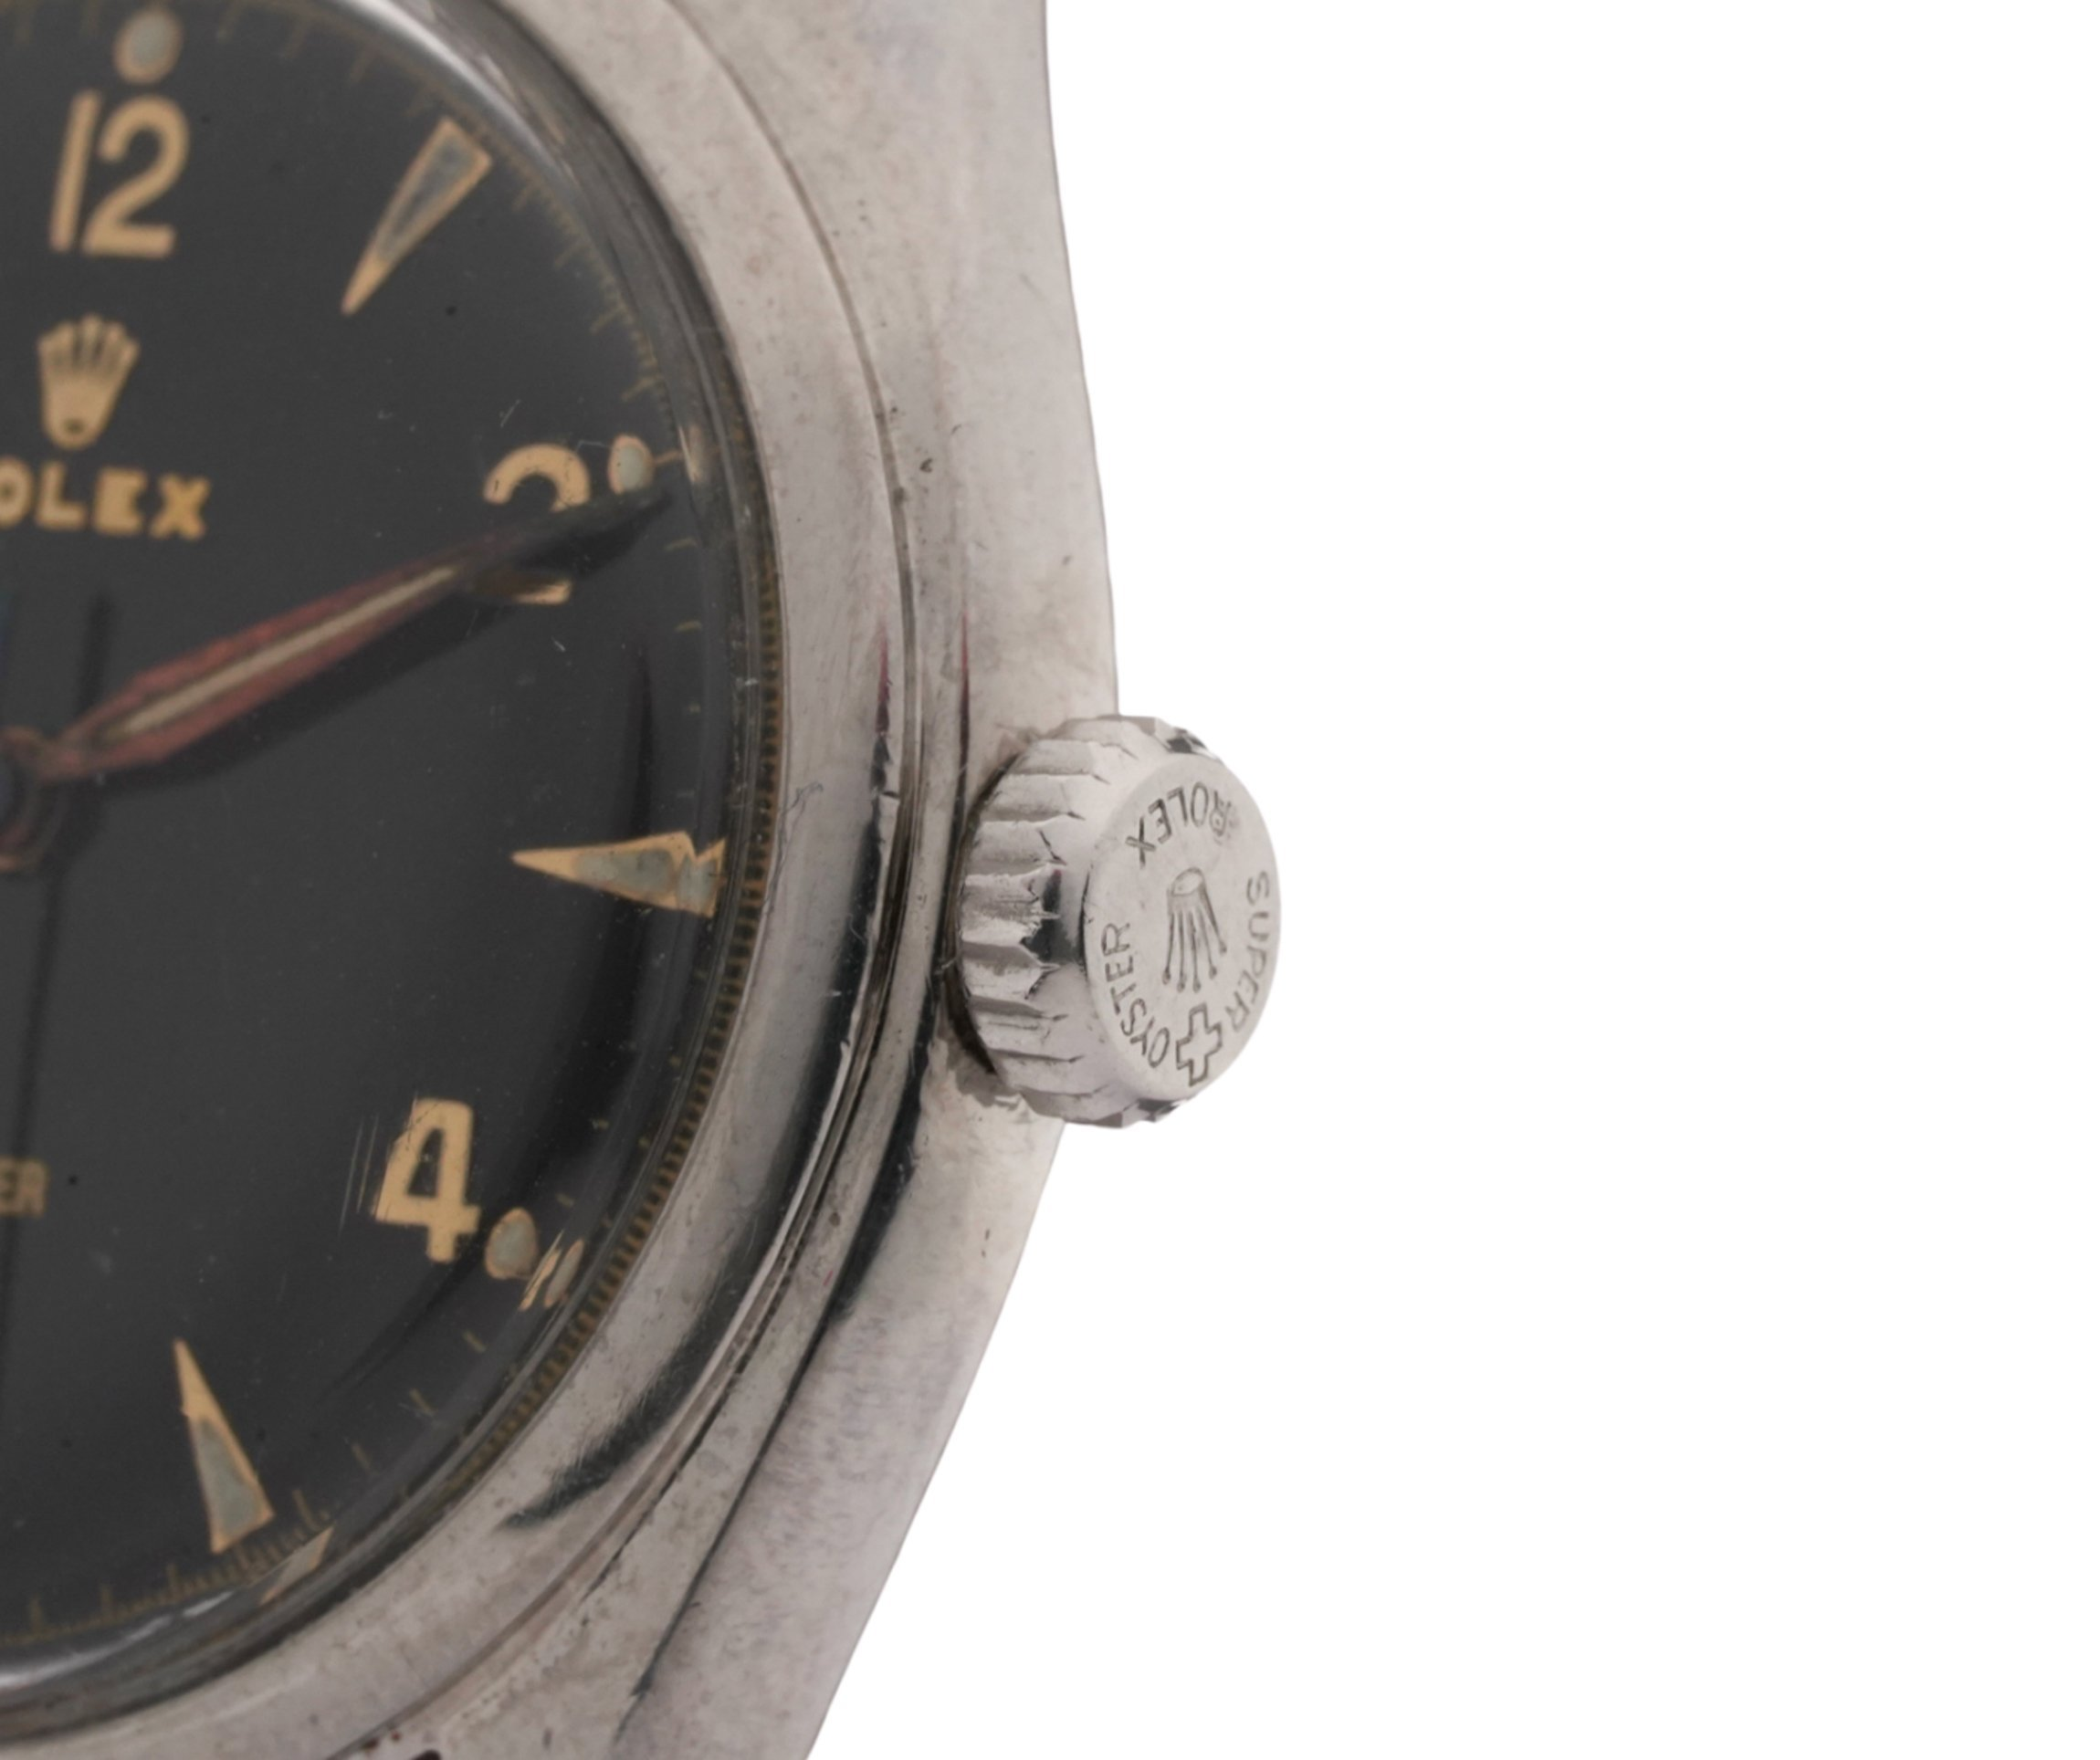 Men's Vintage Rolex Oyster Precision 6022 Swiss 710 Manual Wind Stainless Steel Wrist Watch